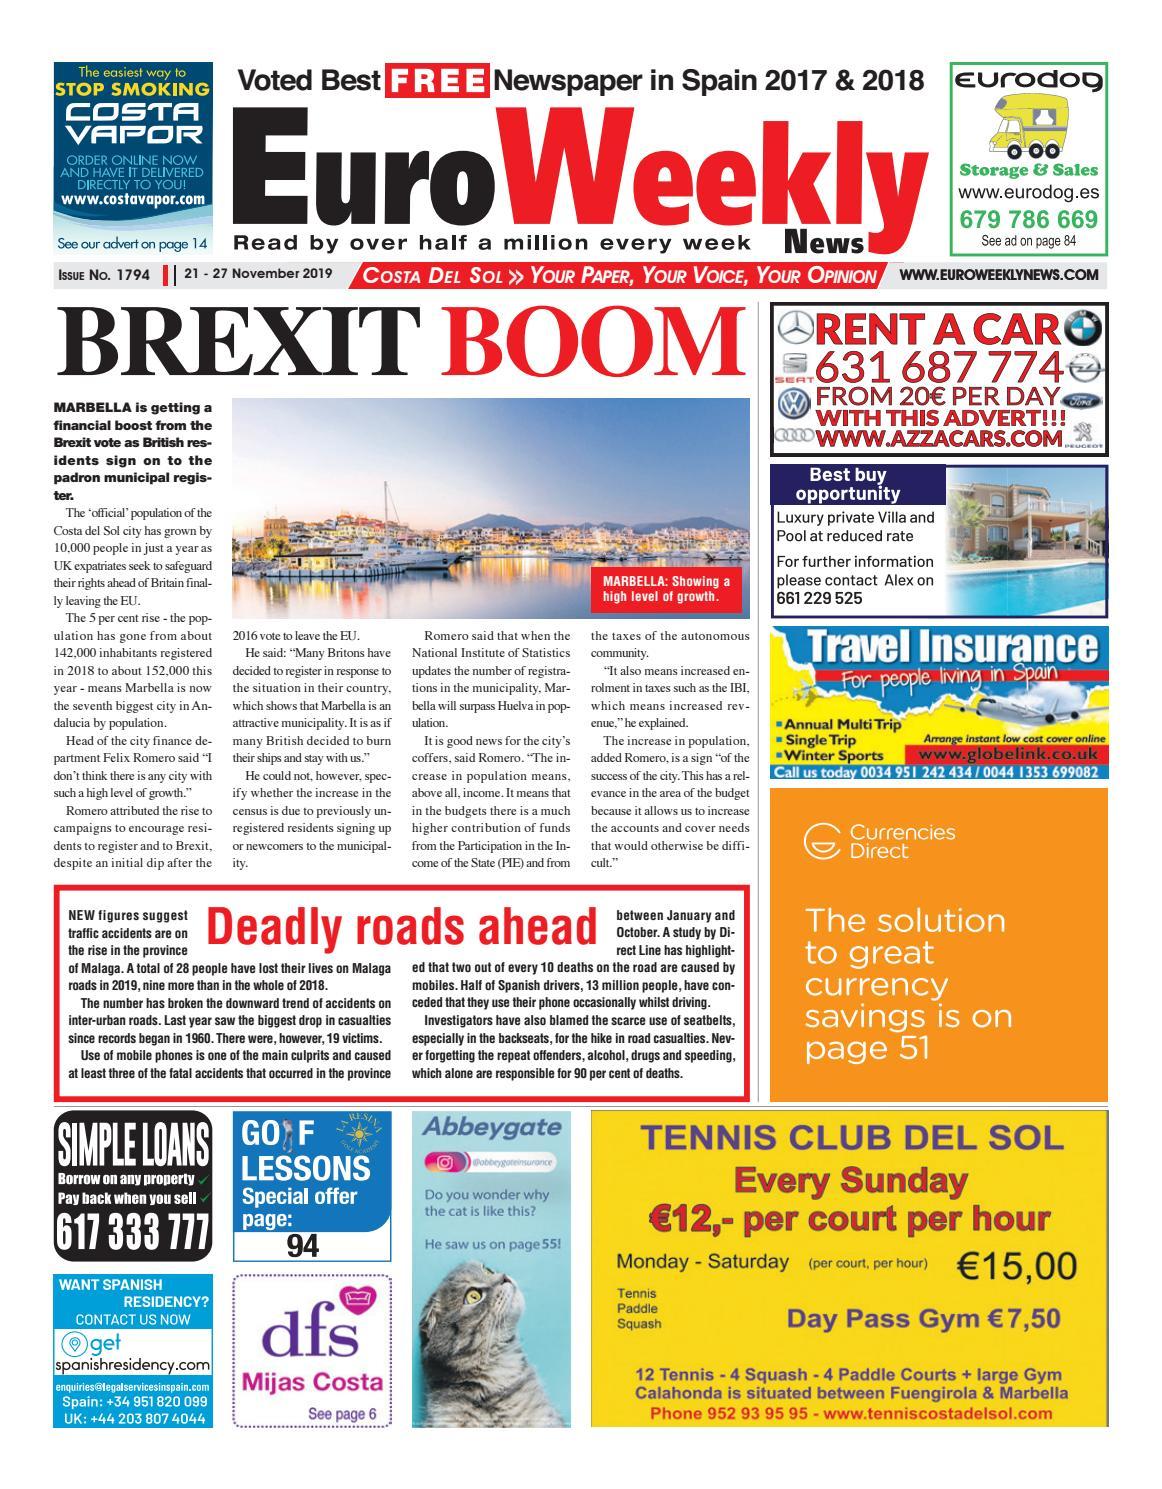 Porn Hub Prosta euro weekly news - costa del sol 21 - 27 november 2019 issue